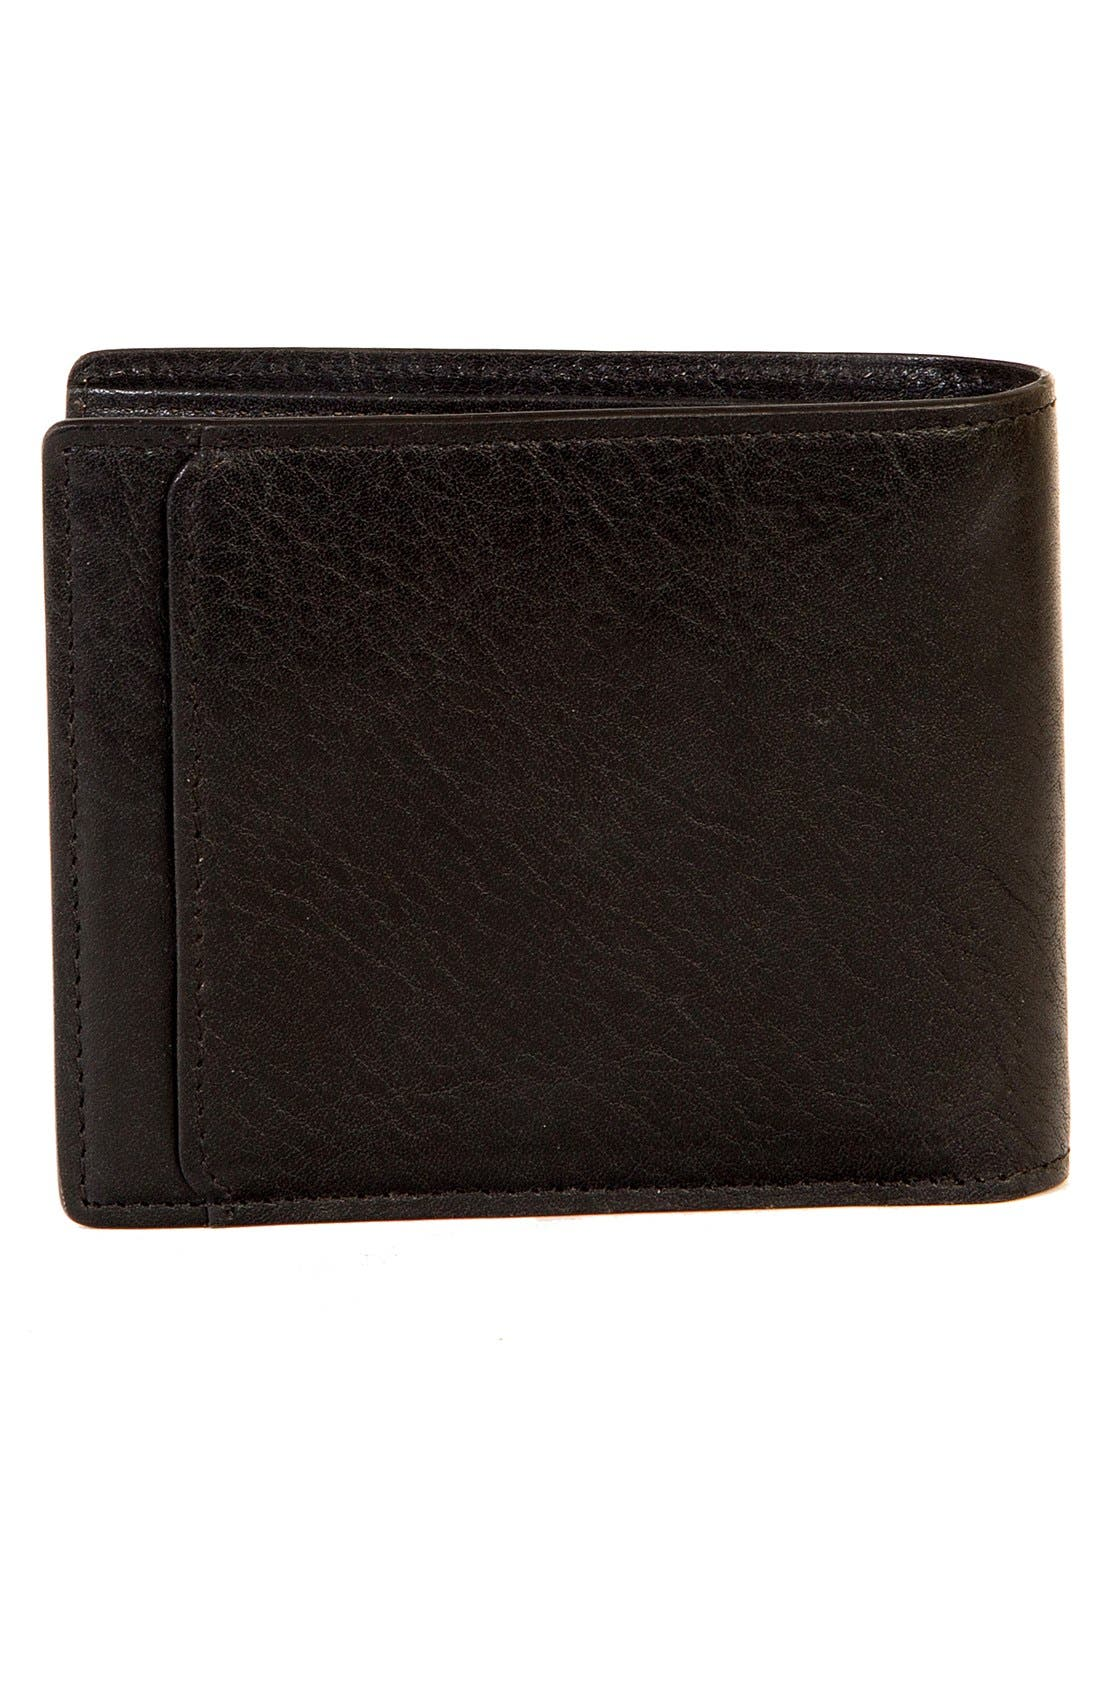 BOCONI,                             'Becker' RFID Leather Wallet,                             Alternate thumbnail 2, color,                             BLACK